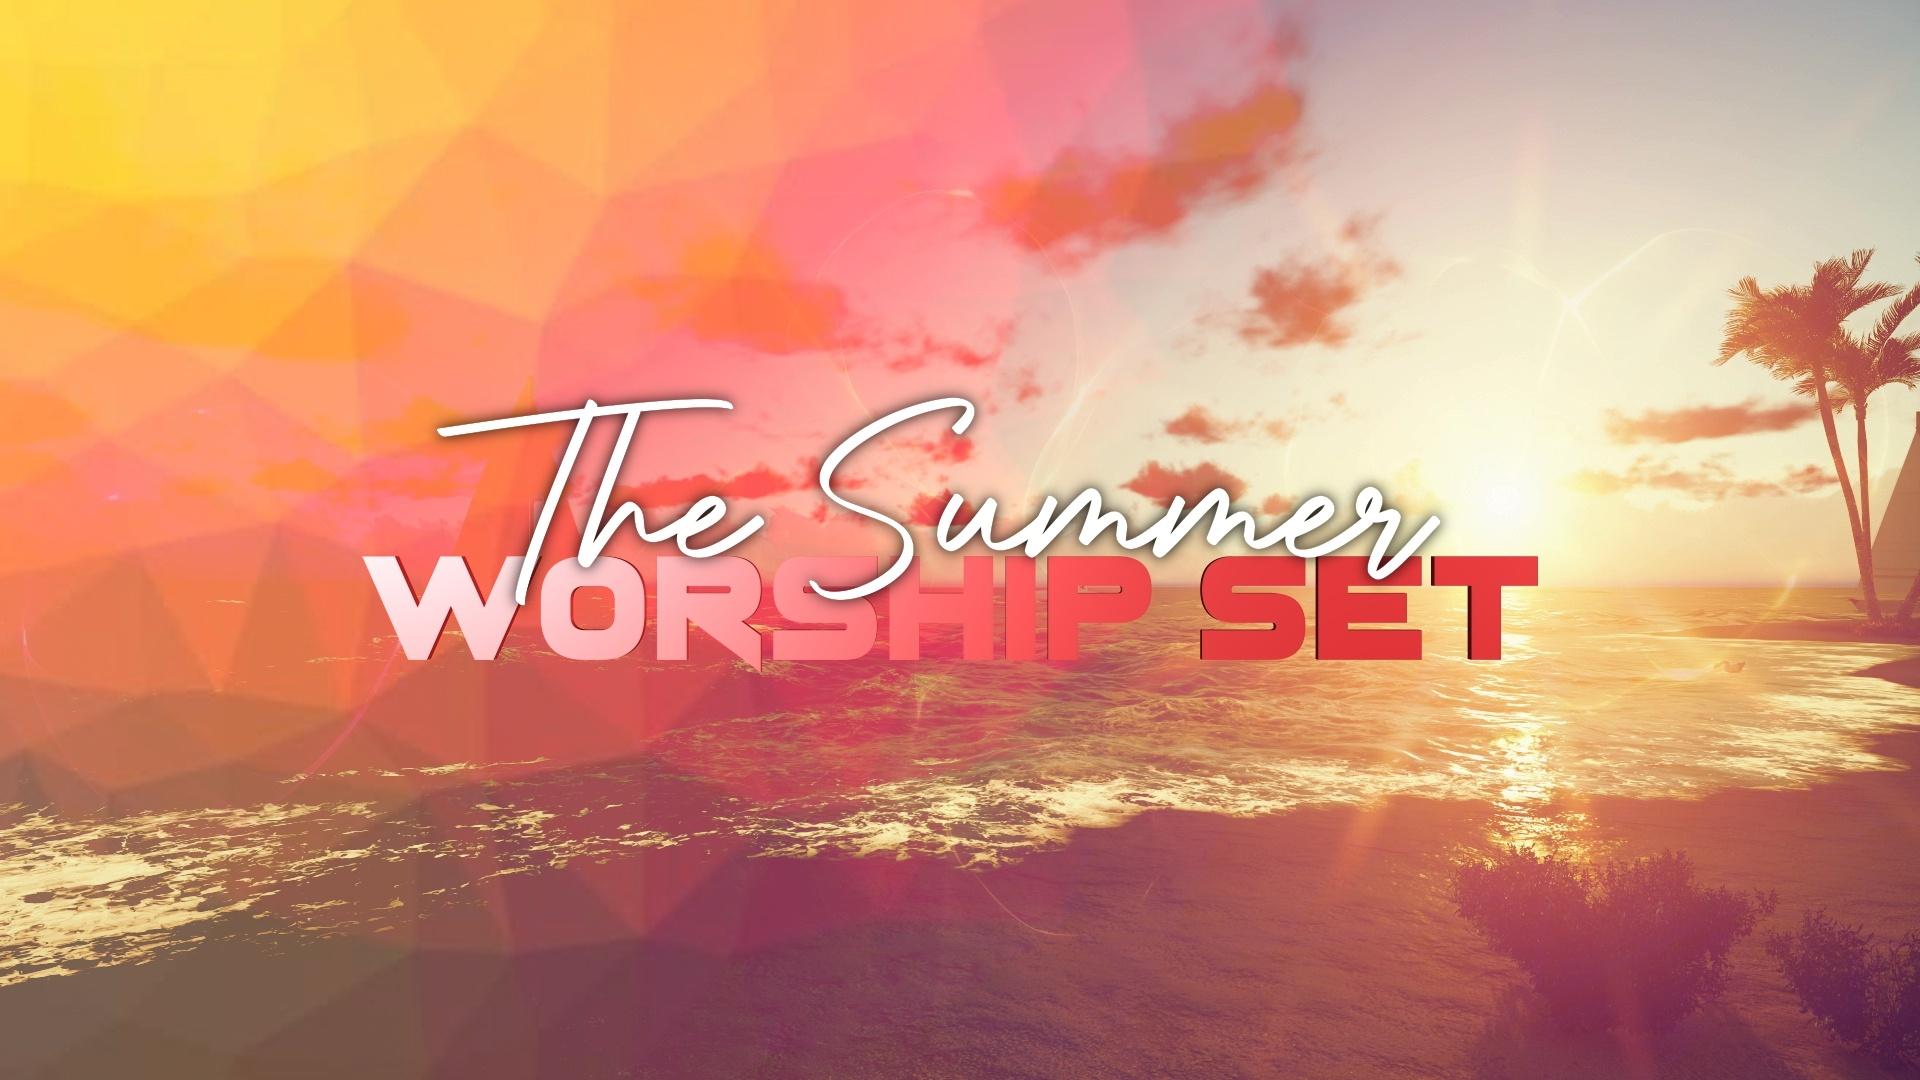 The Summer Worship Set